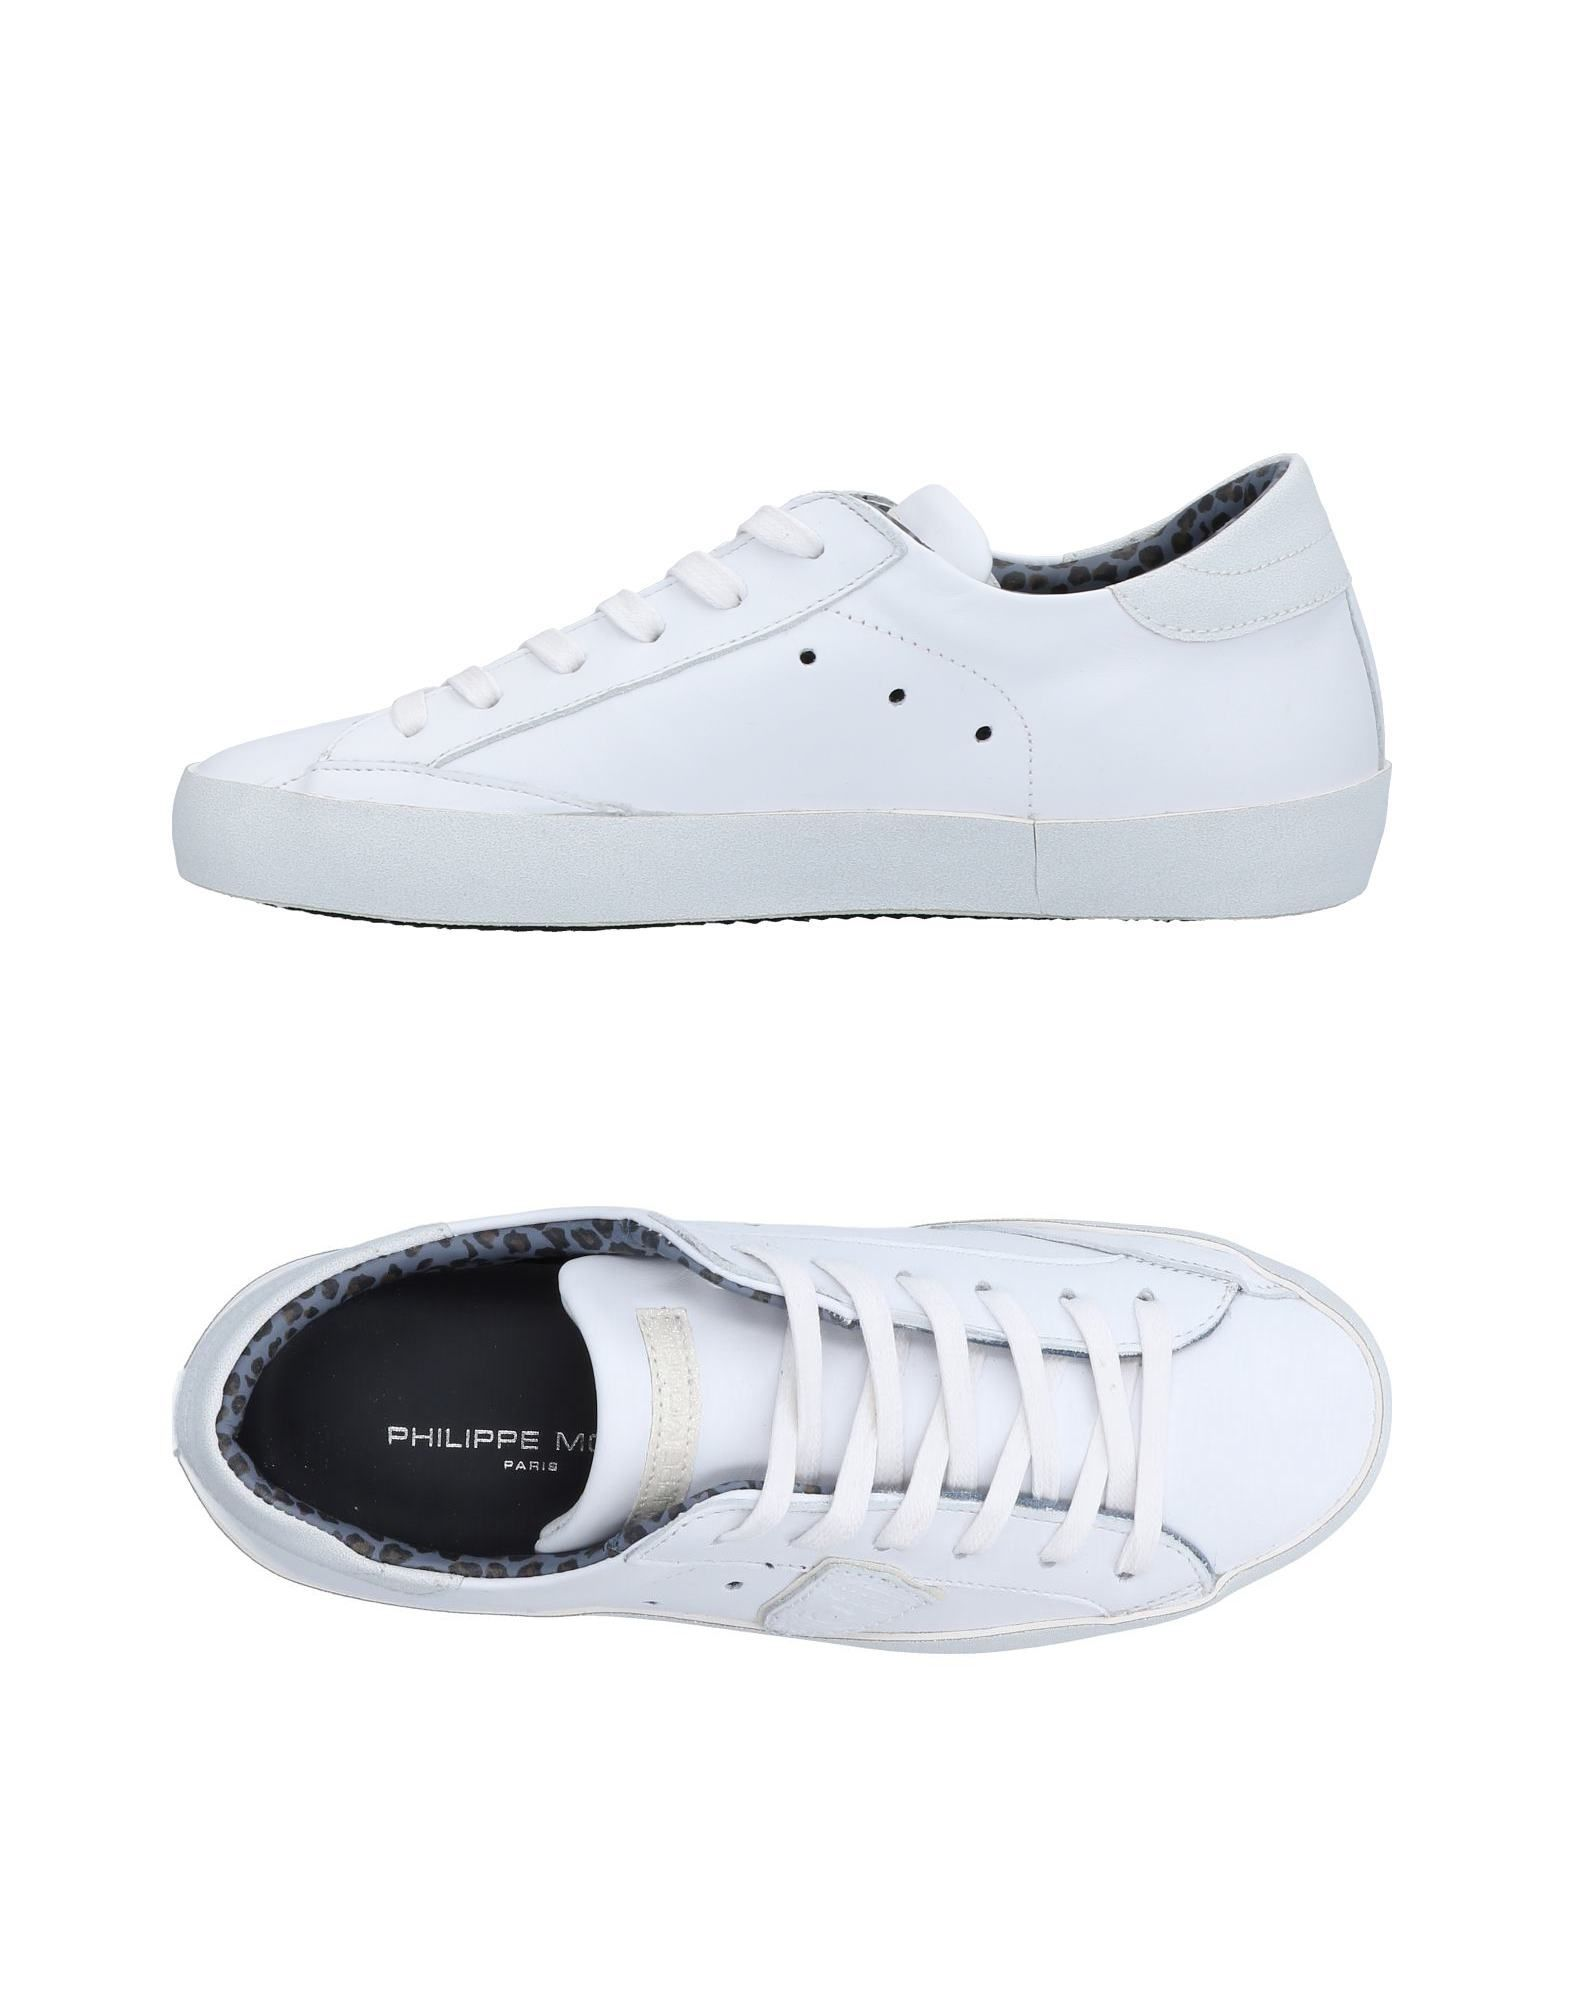 Philippe Model Sneakers Damen  11460868IIGut aussehende strapazierfähige Schuhe